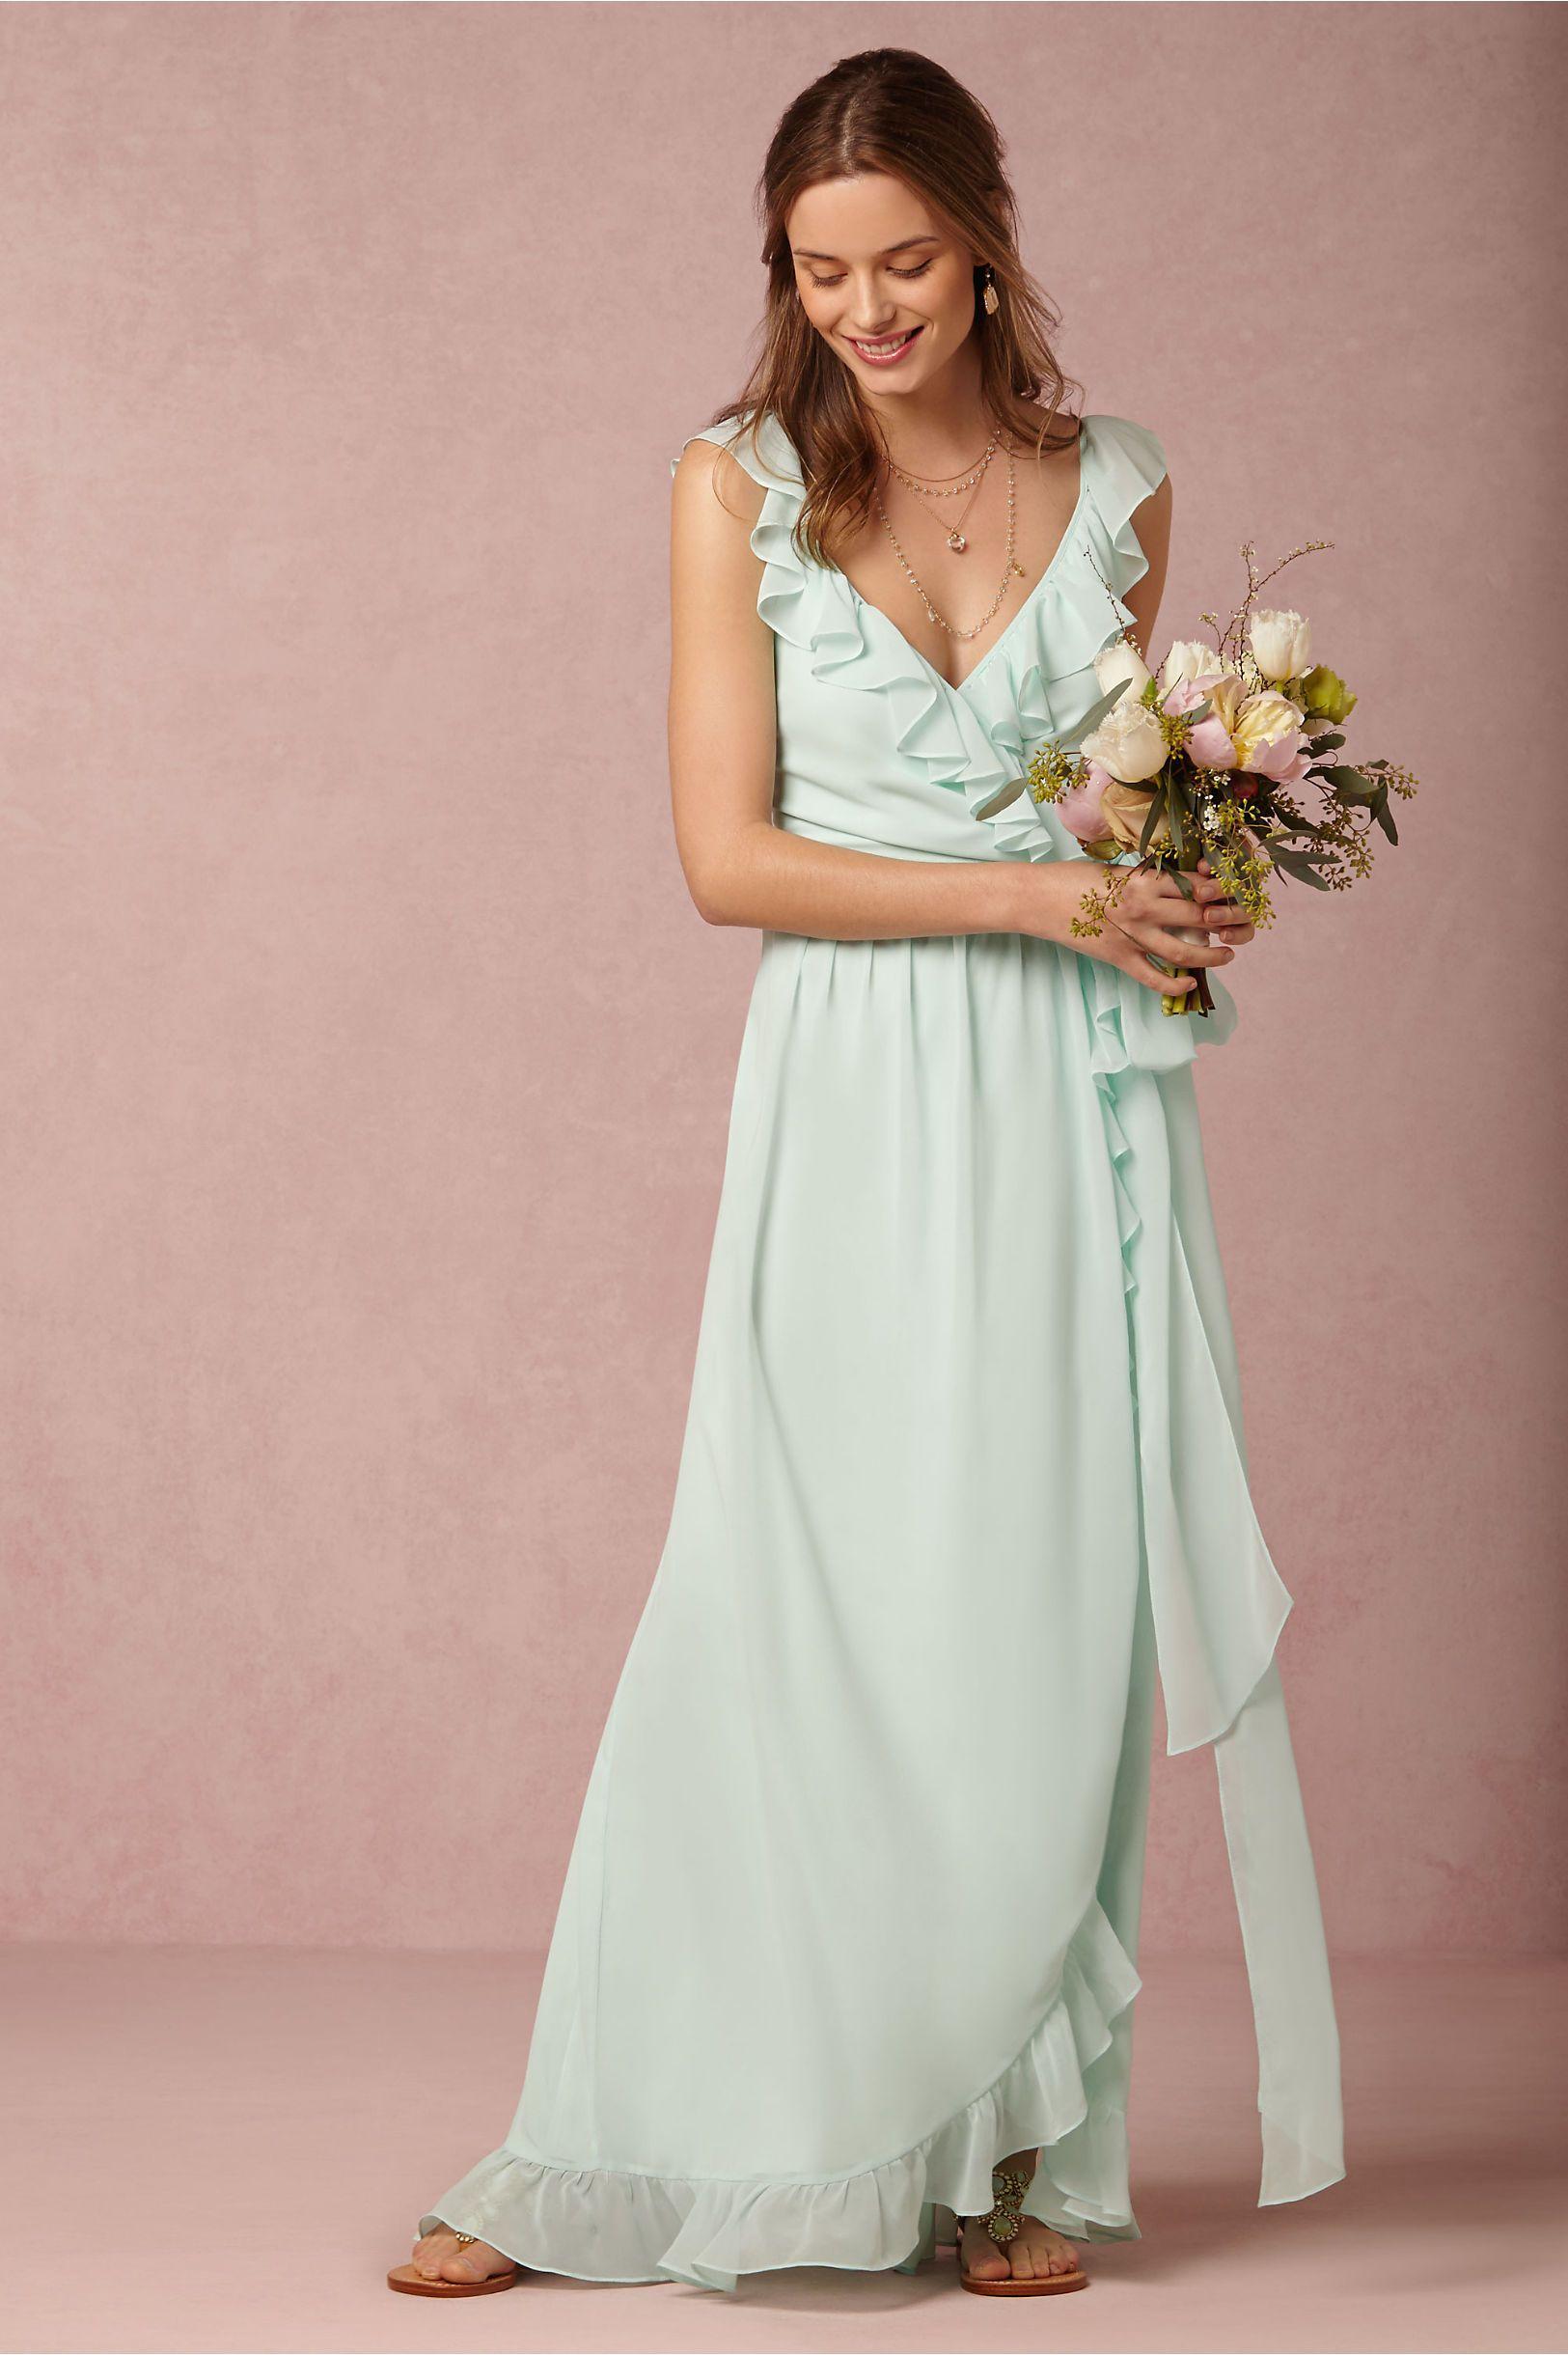 Polly dress in bridal party u guests bridesmaids at bhldn wedding